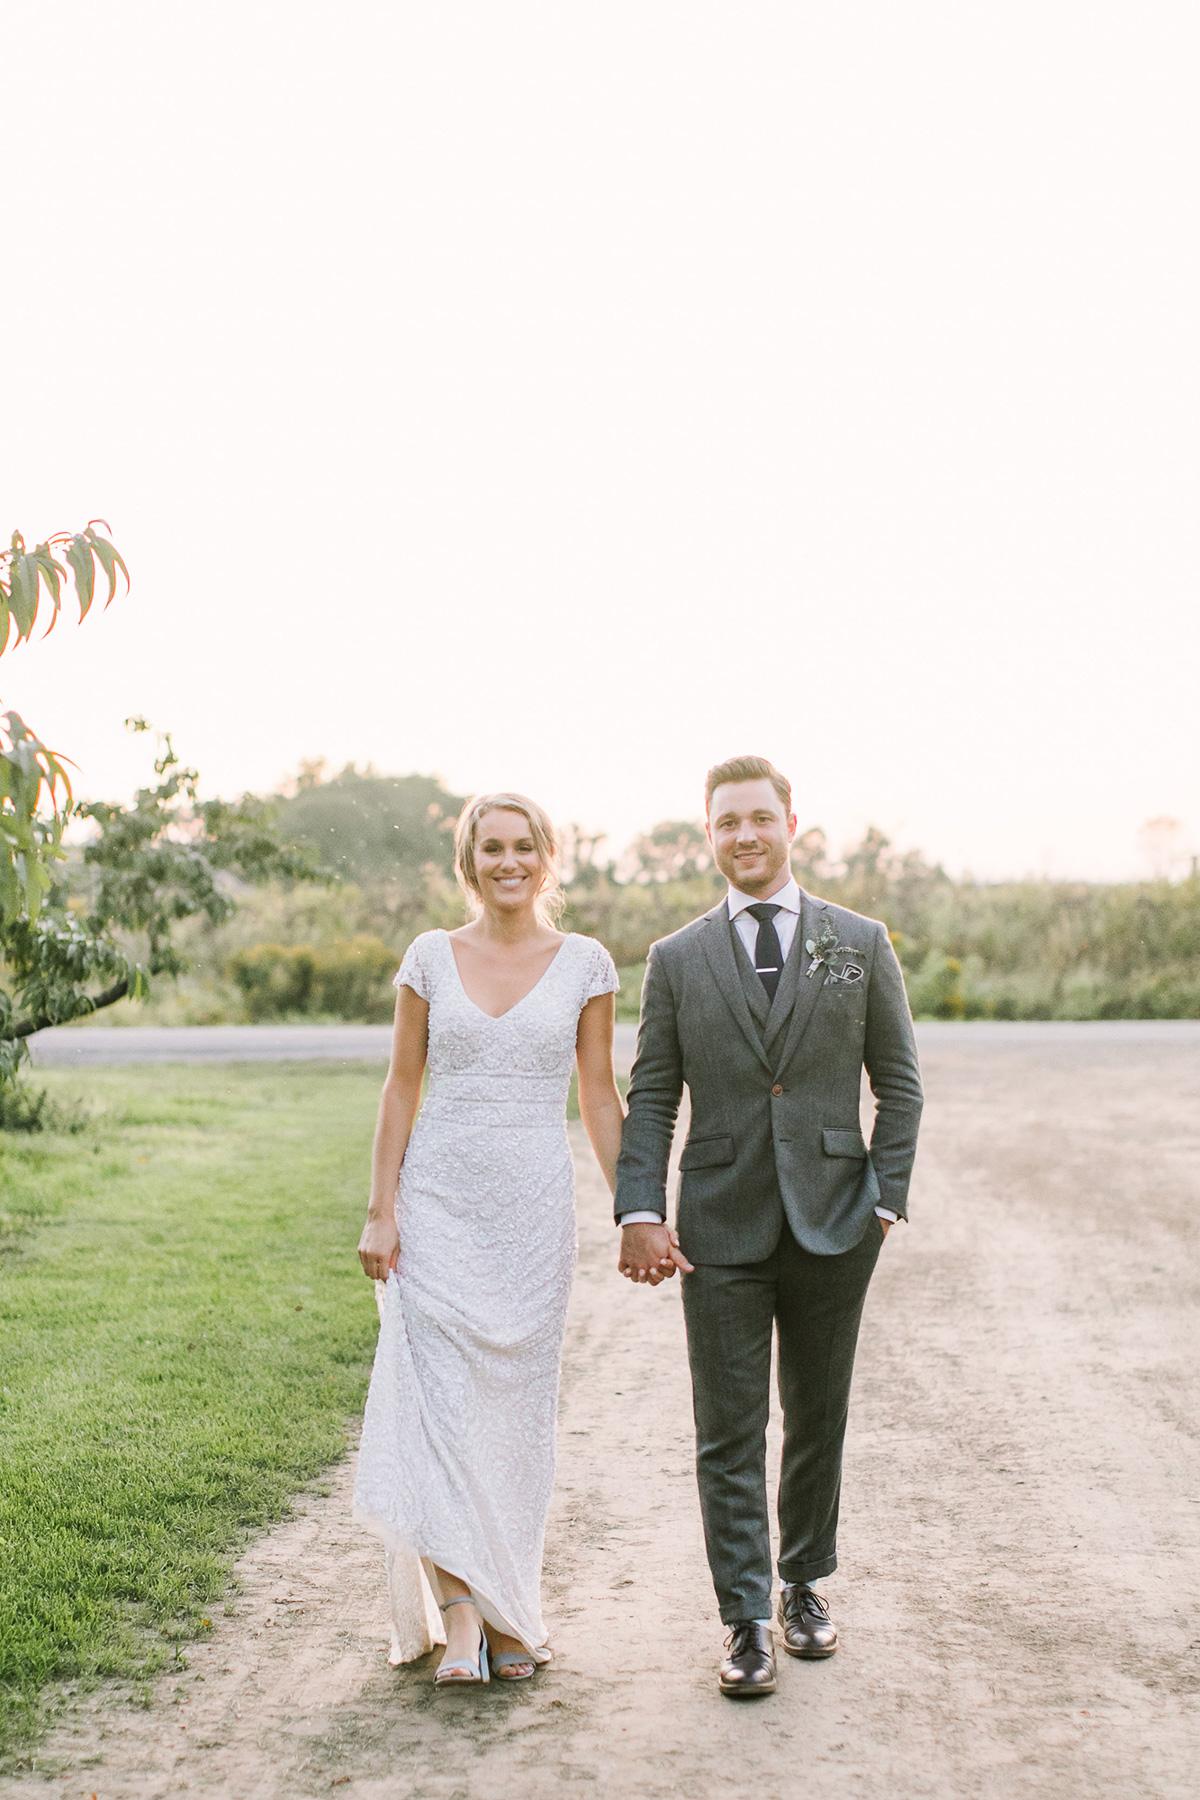 elizabeth-in-love-vineyard-bride-swish-list-cherry-avenue-farms-vineland-wedding-66.jpg